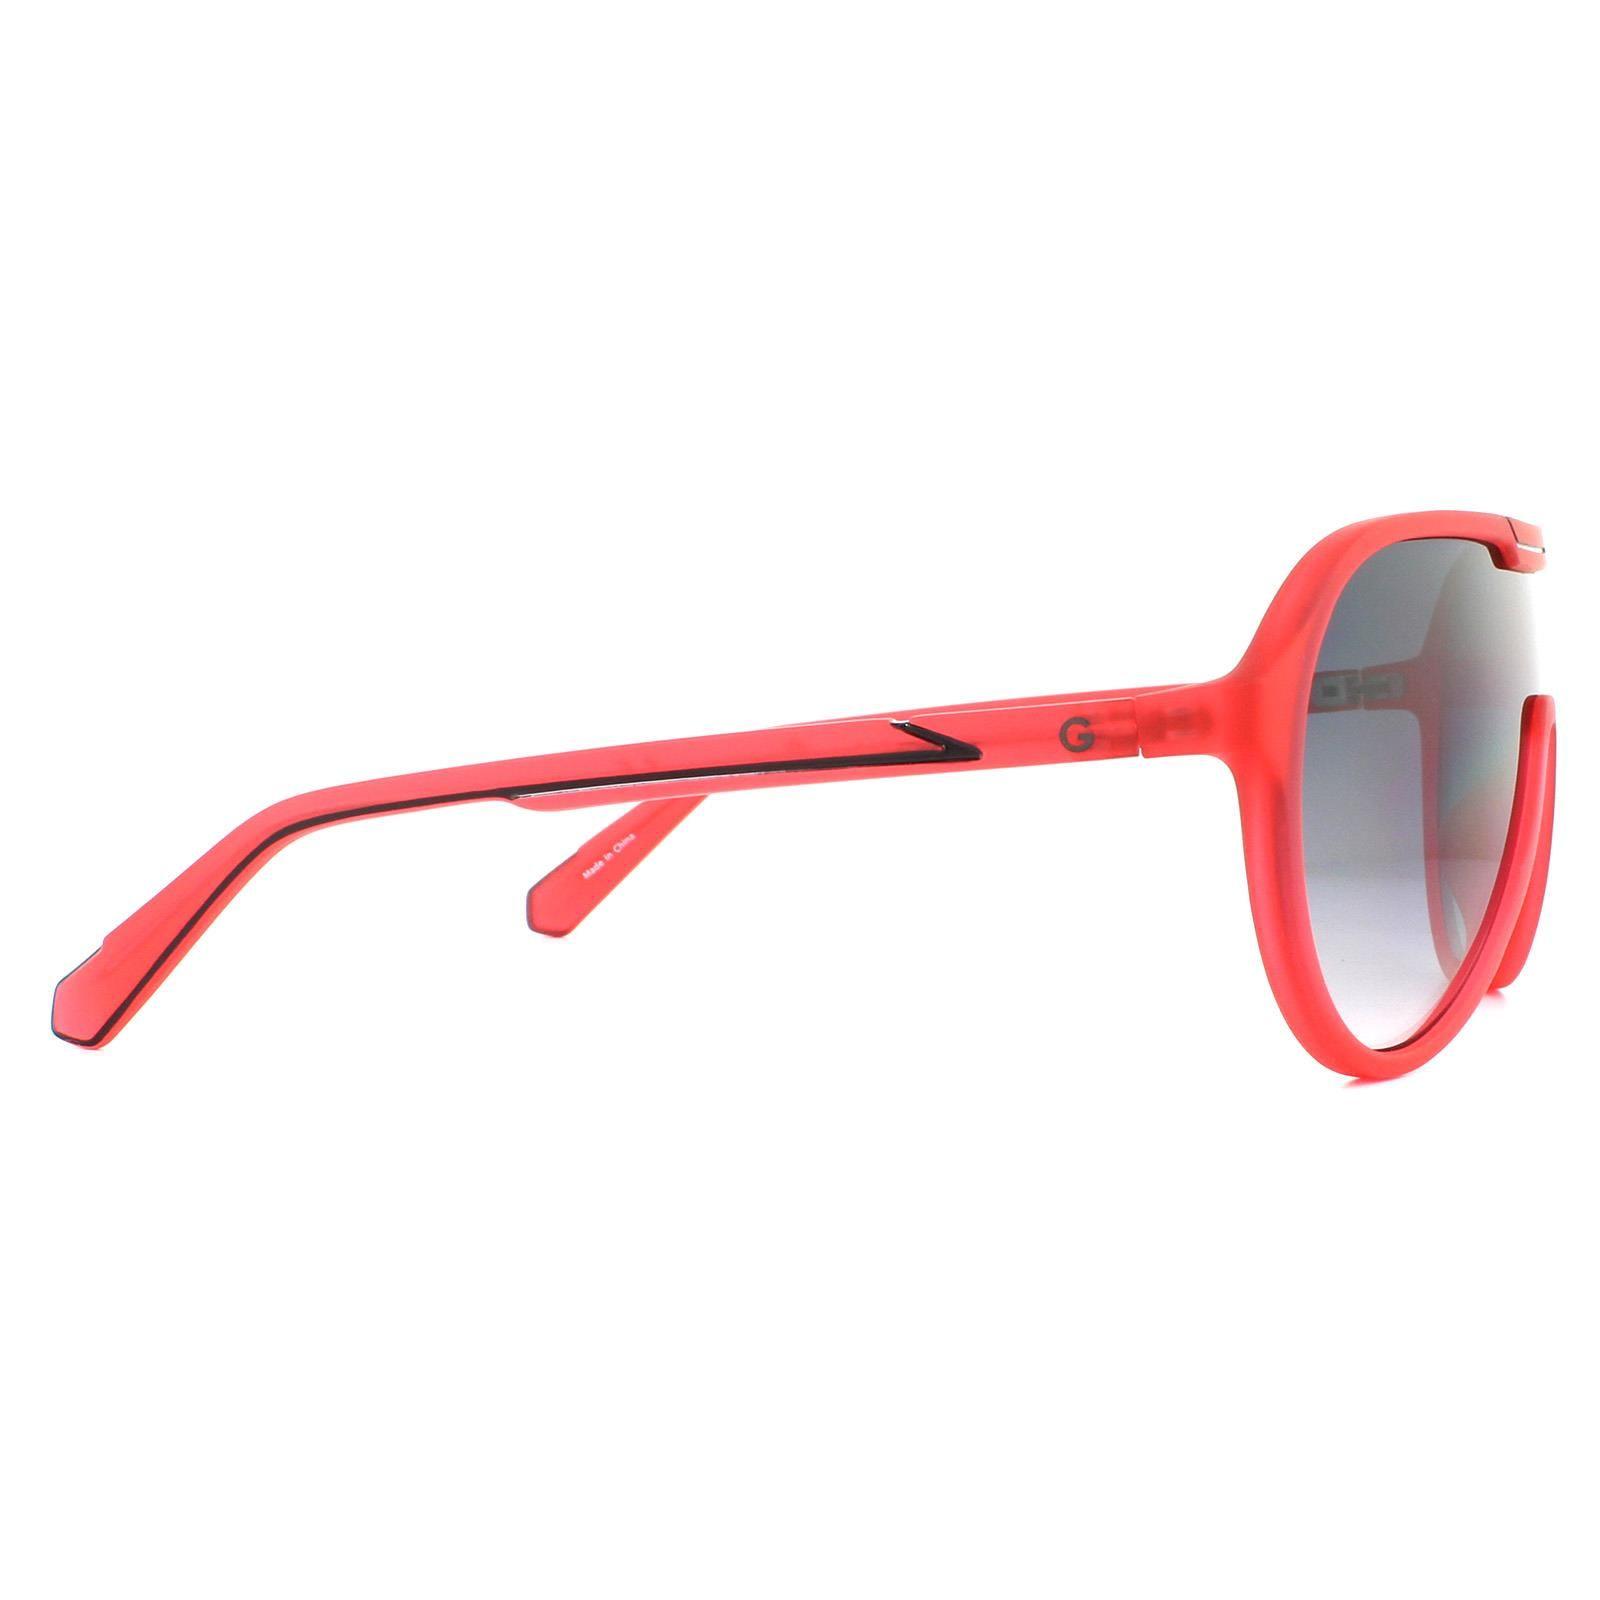 Guess Sunglasses GG2146 67B Matte Red Smoke Grey Gradient